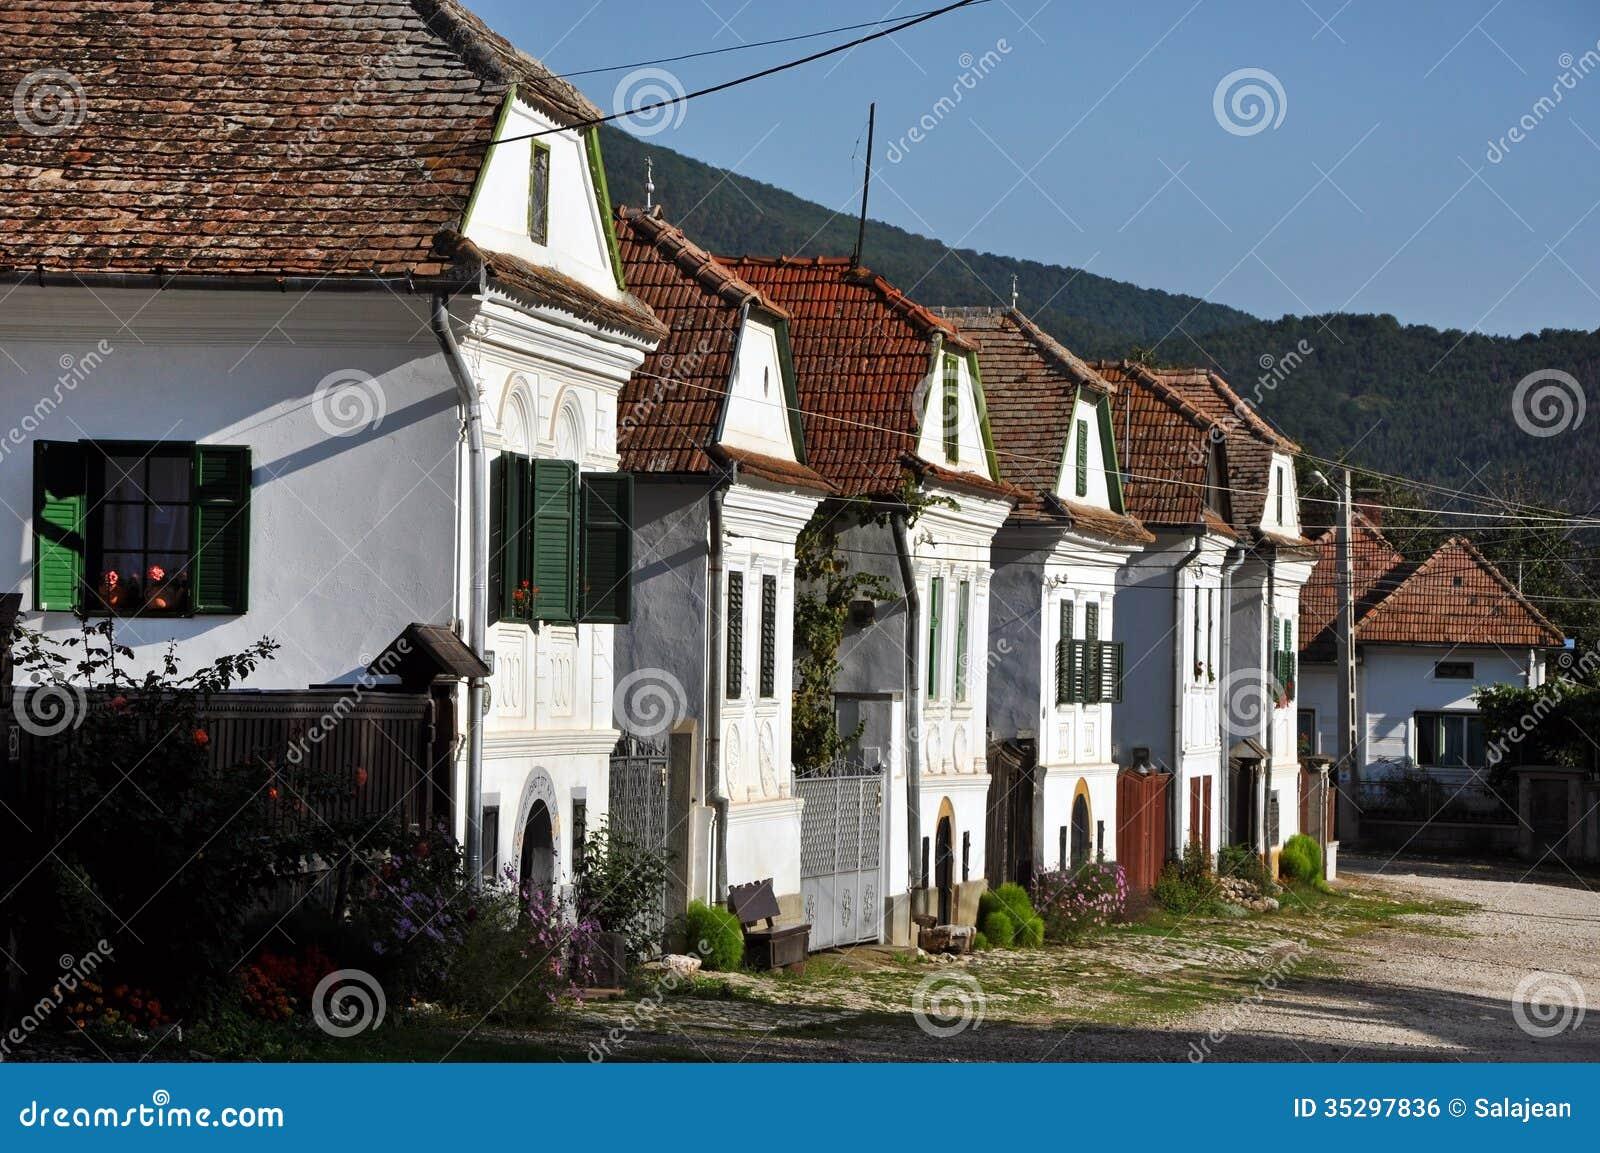 Whitewashed Houses In Torocko Rimetea Village Romania Stock Photo Image 35297836